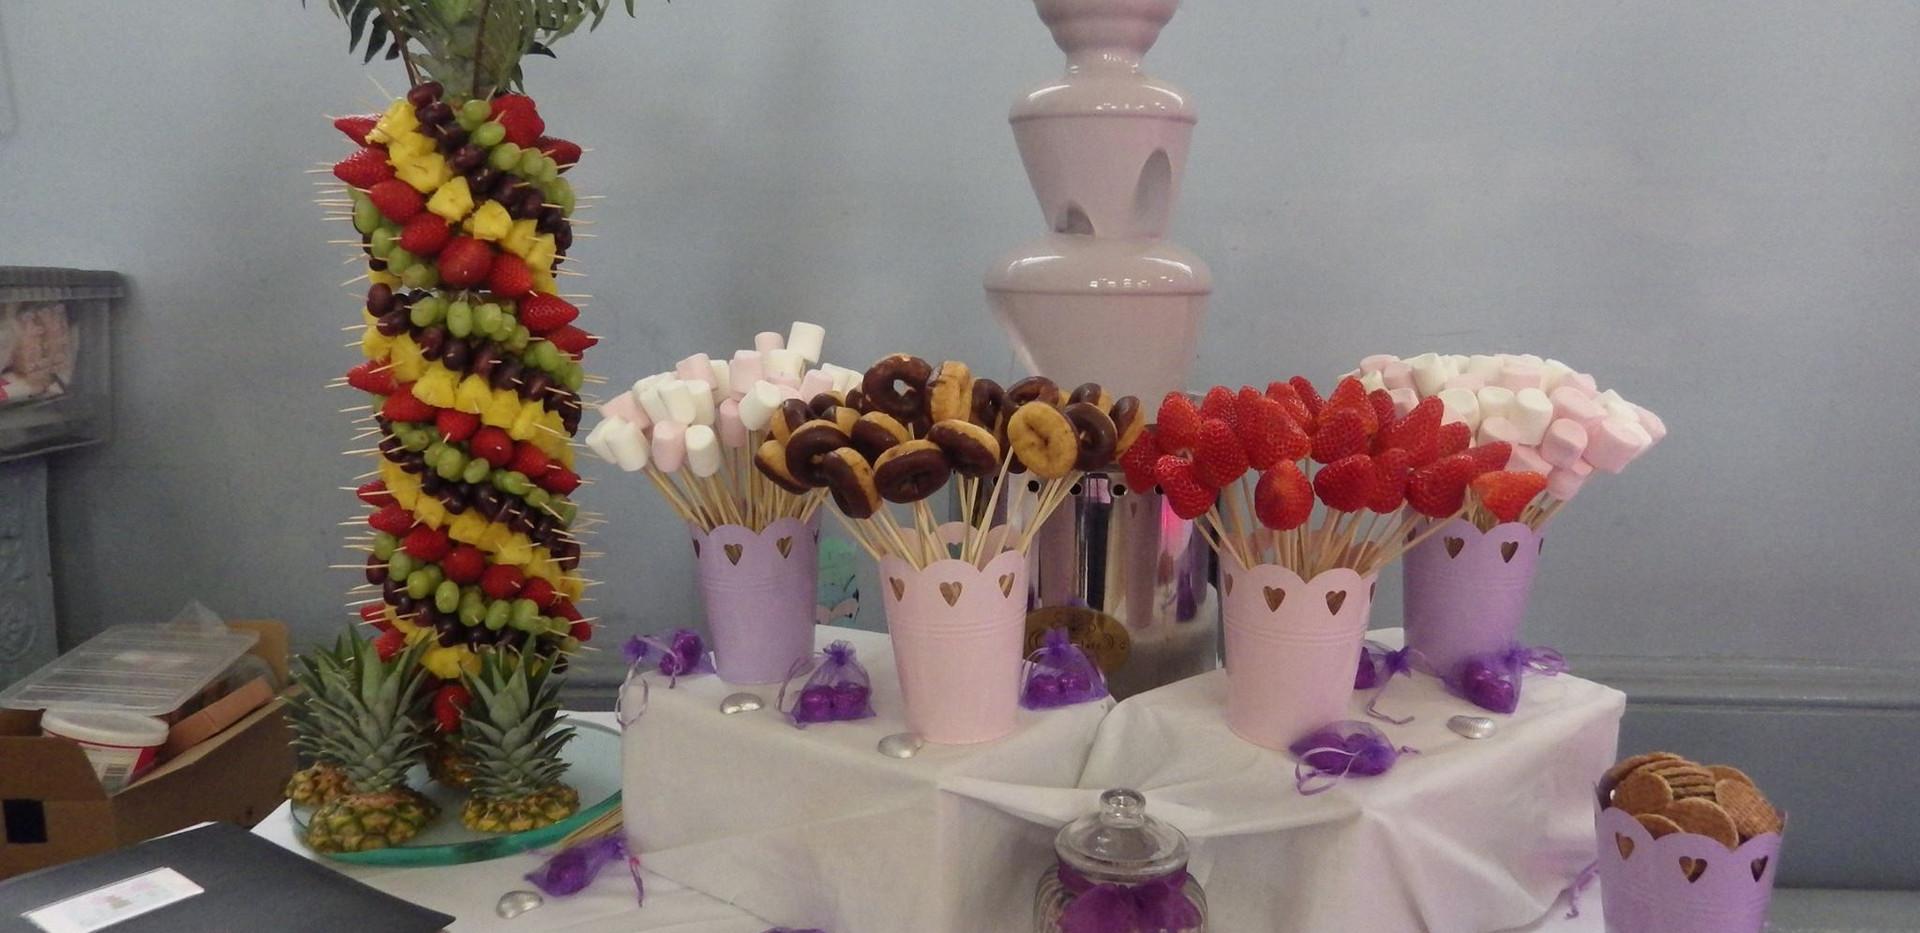 Lilac Chocolate Fountain | Chocolate Falls